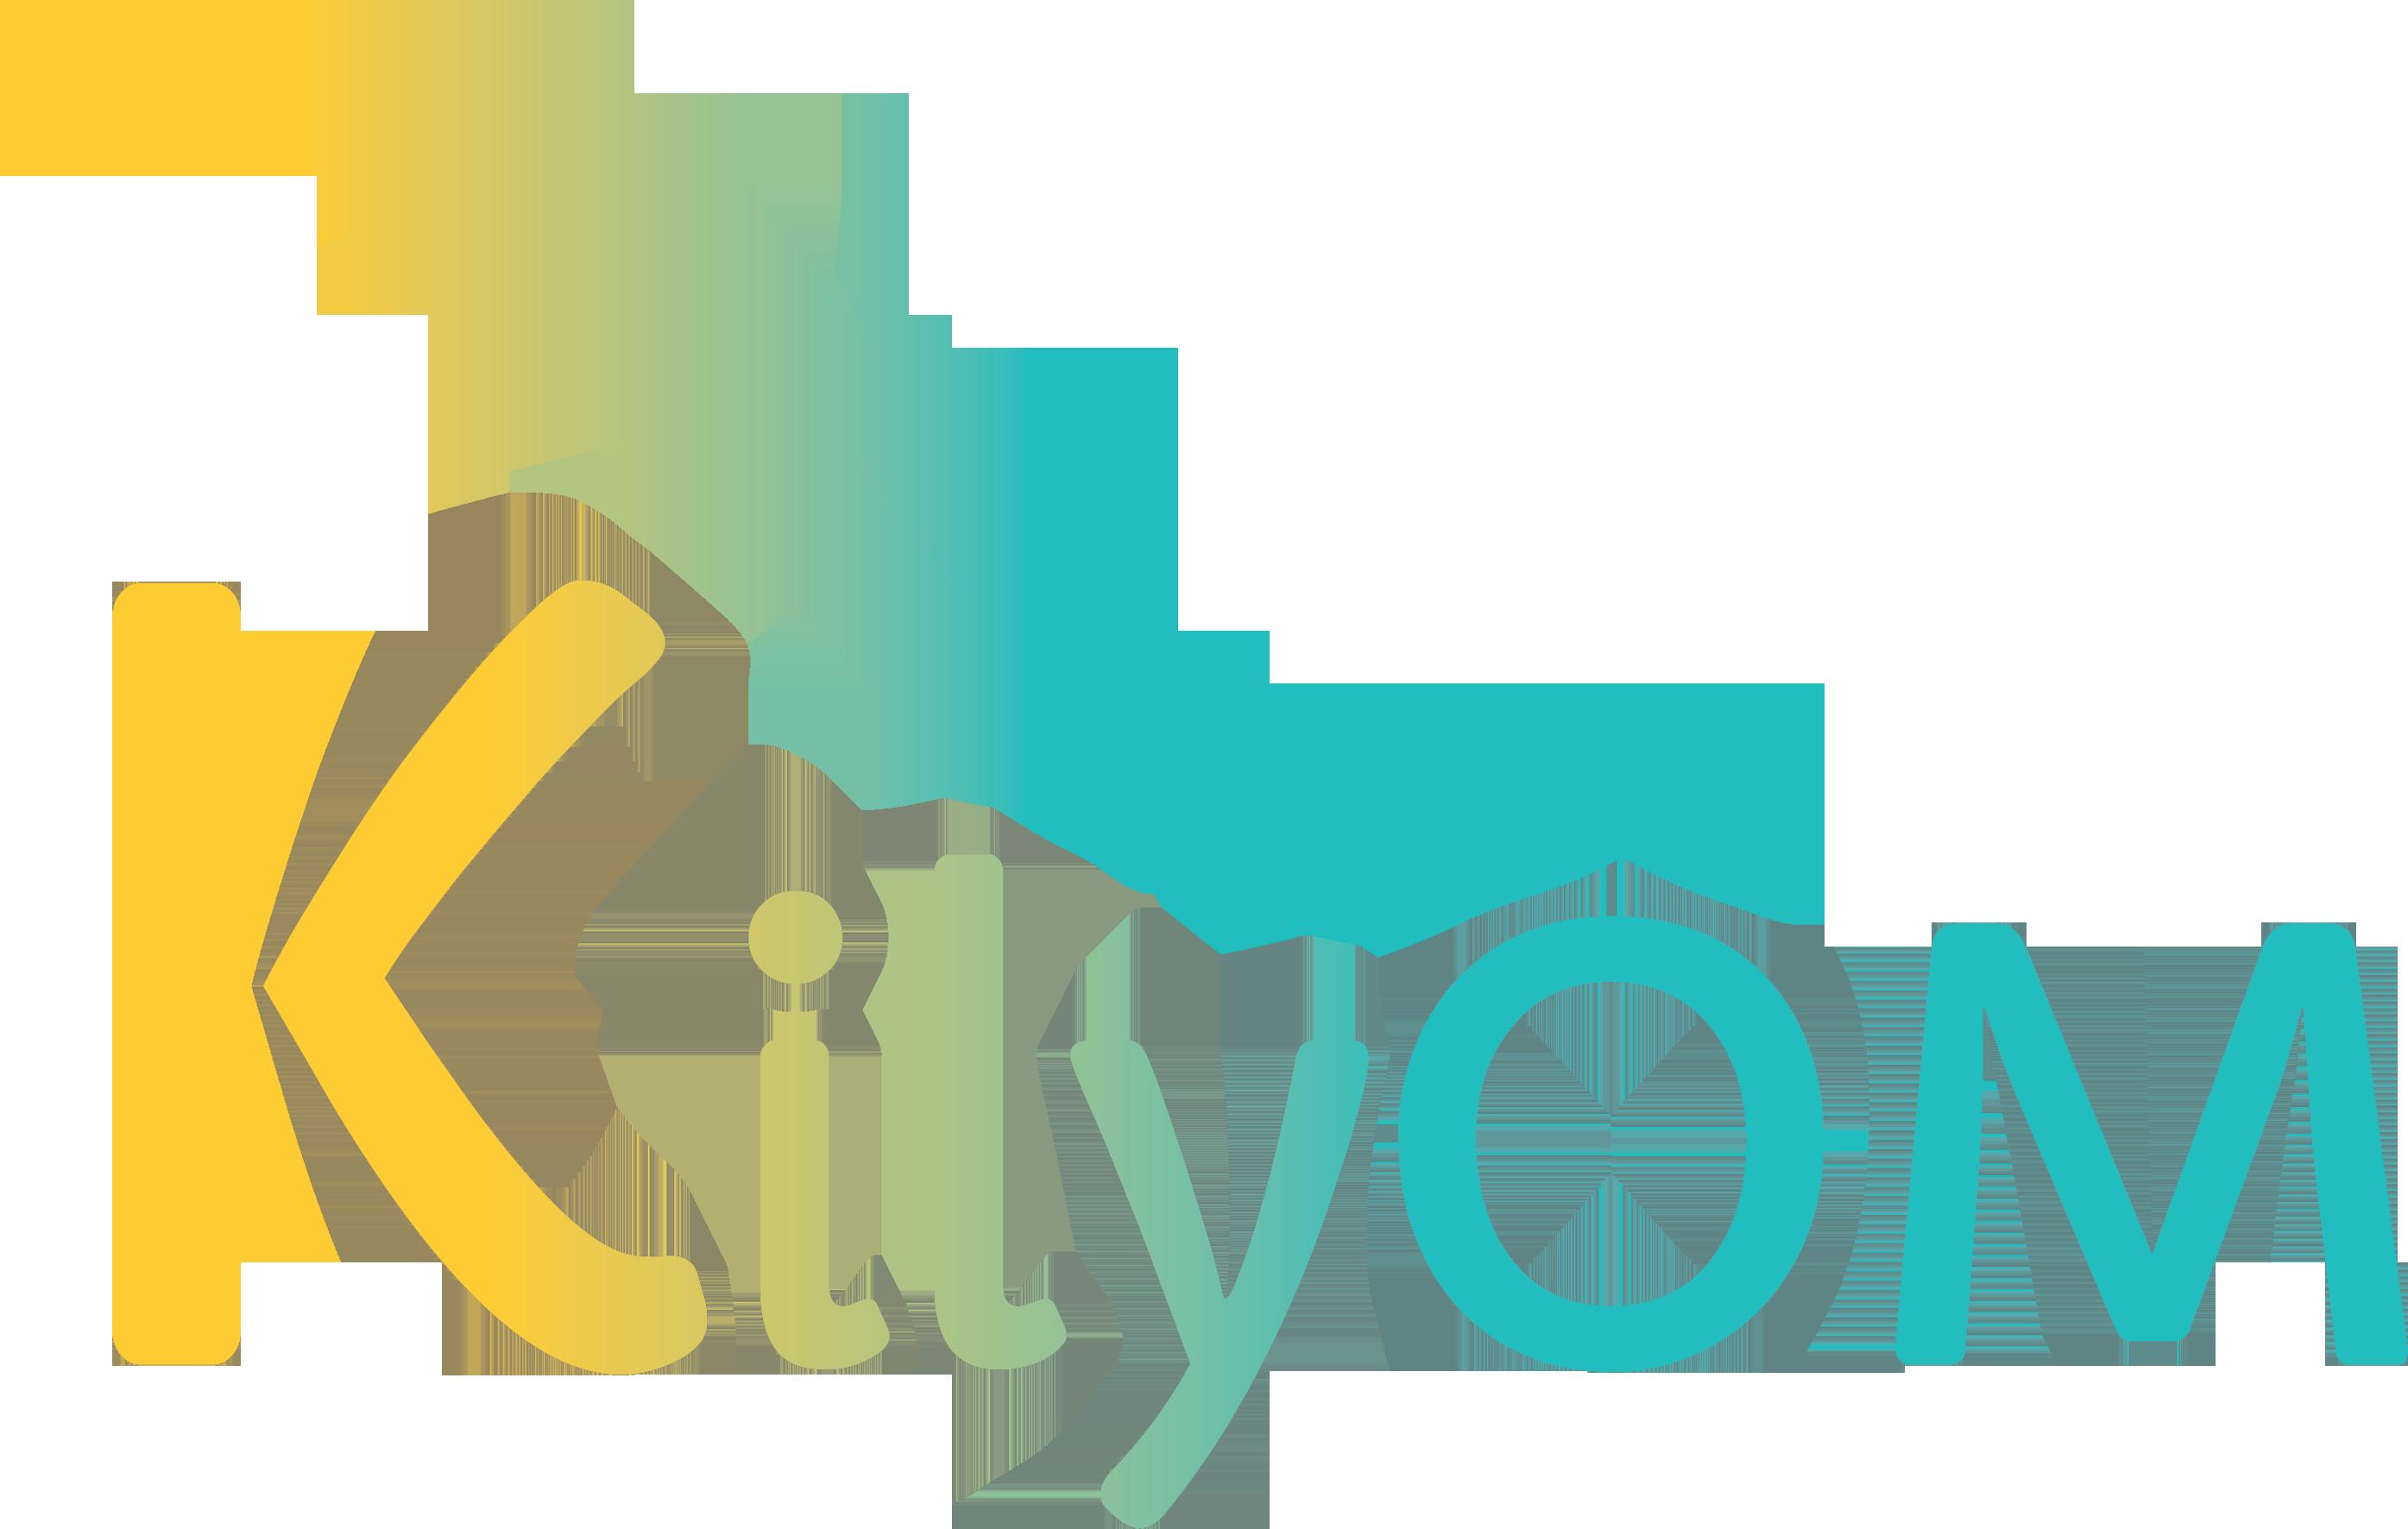 KilyOM